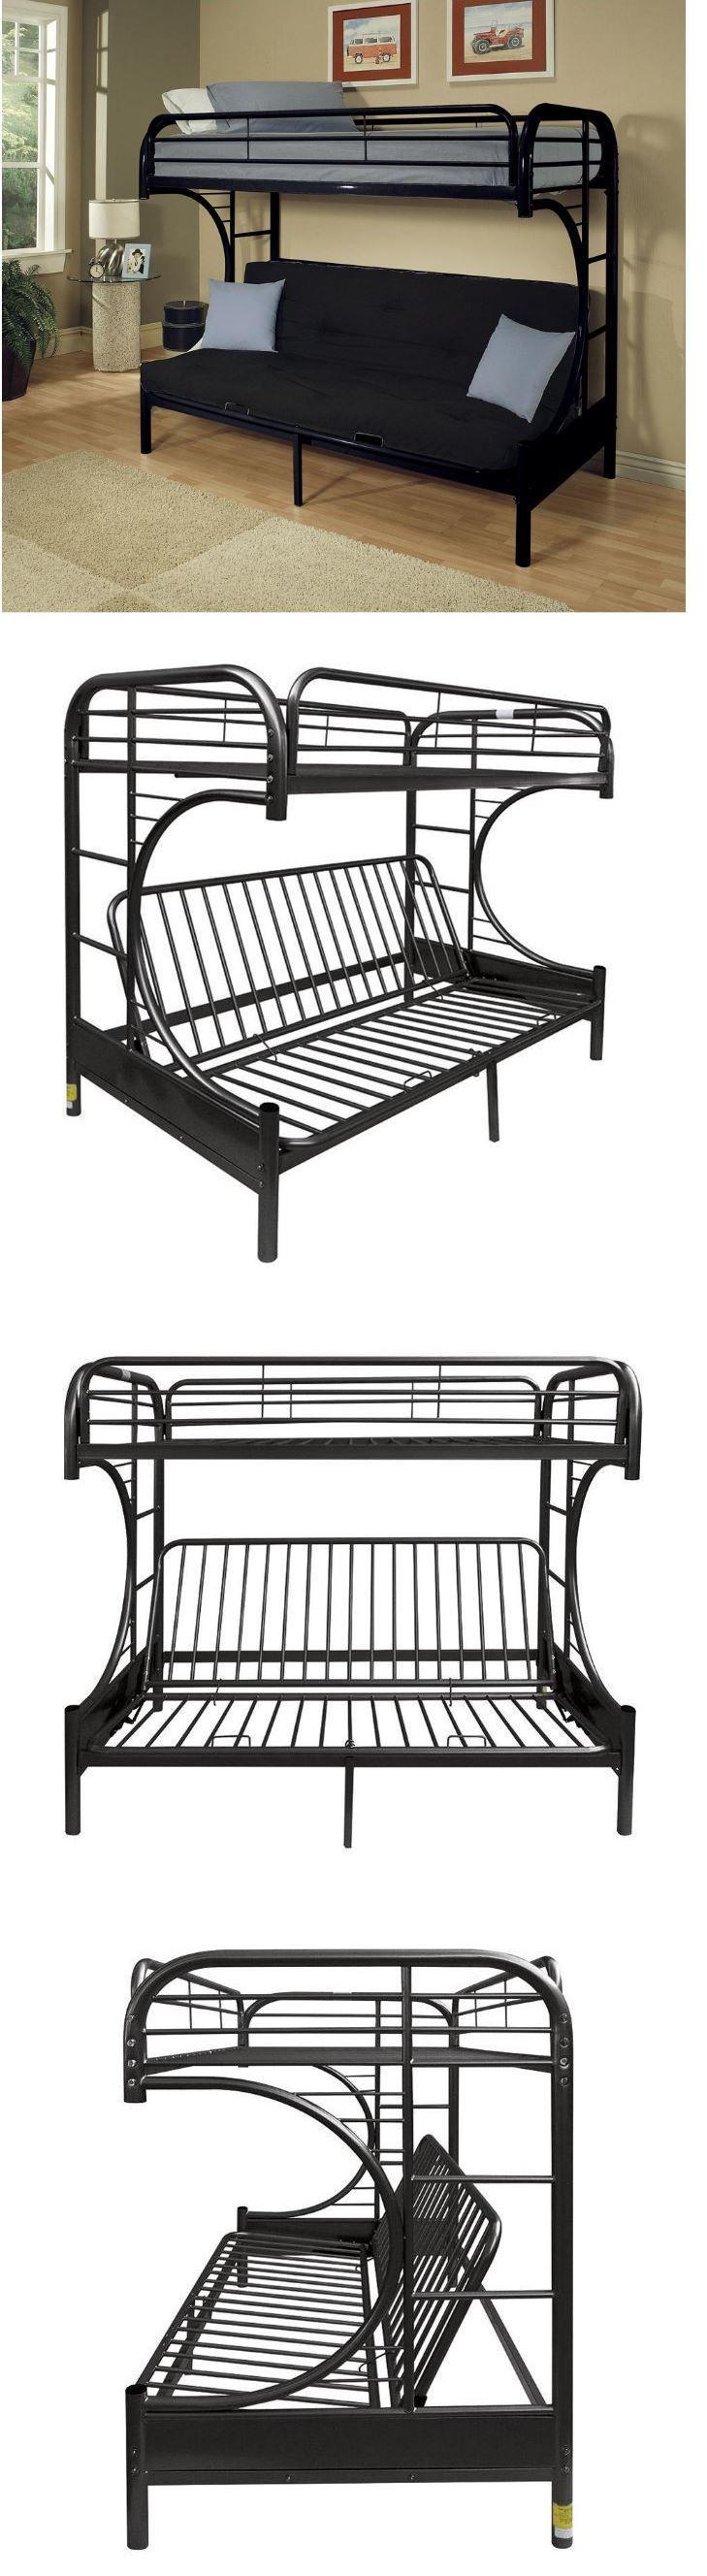 Bedroom Furniture 66742 Bunk Beds Student Loft Bed Frame For S Kids Twin Over